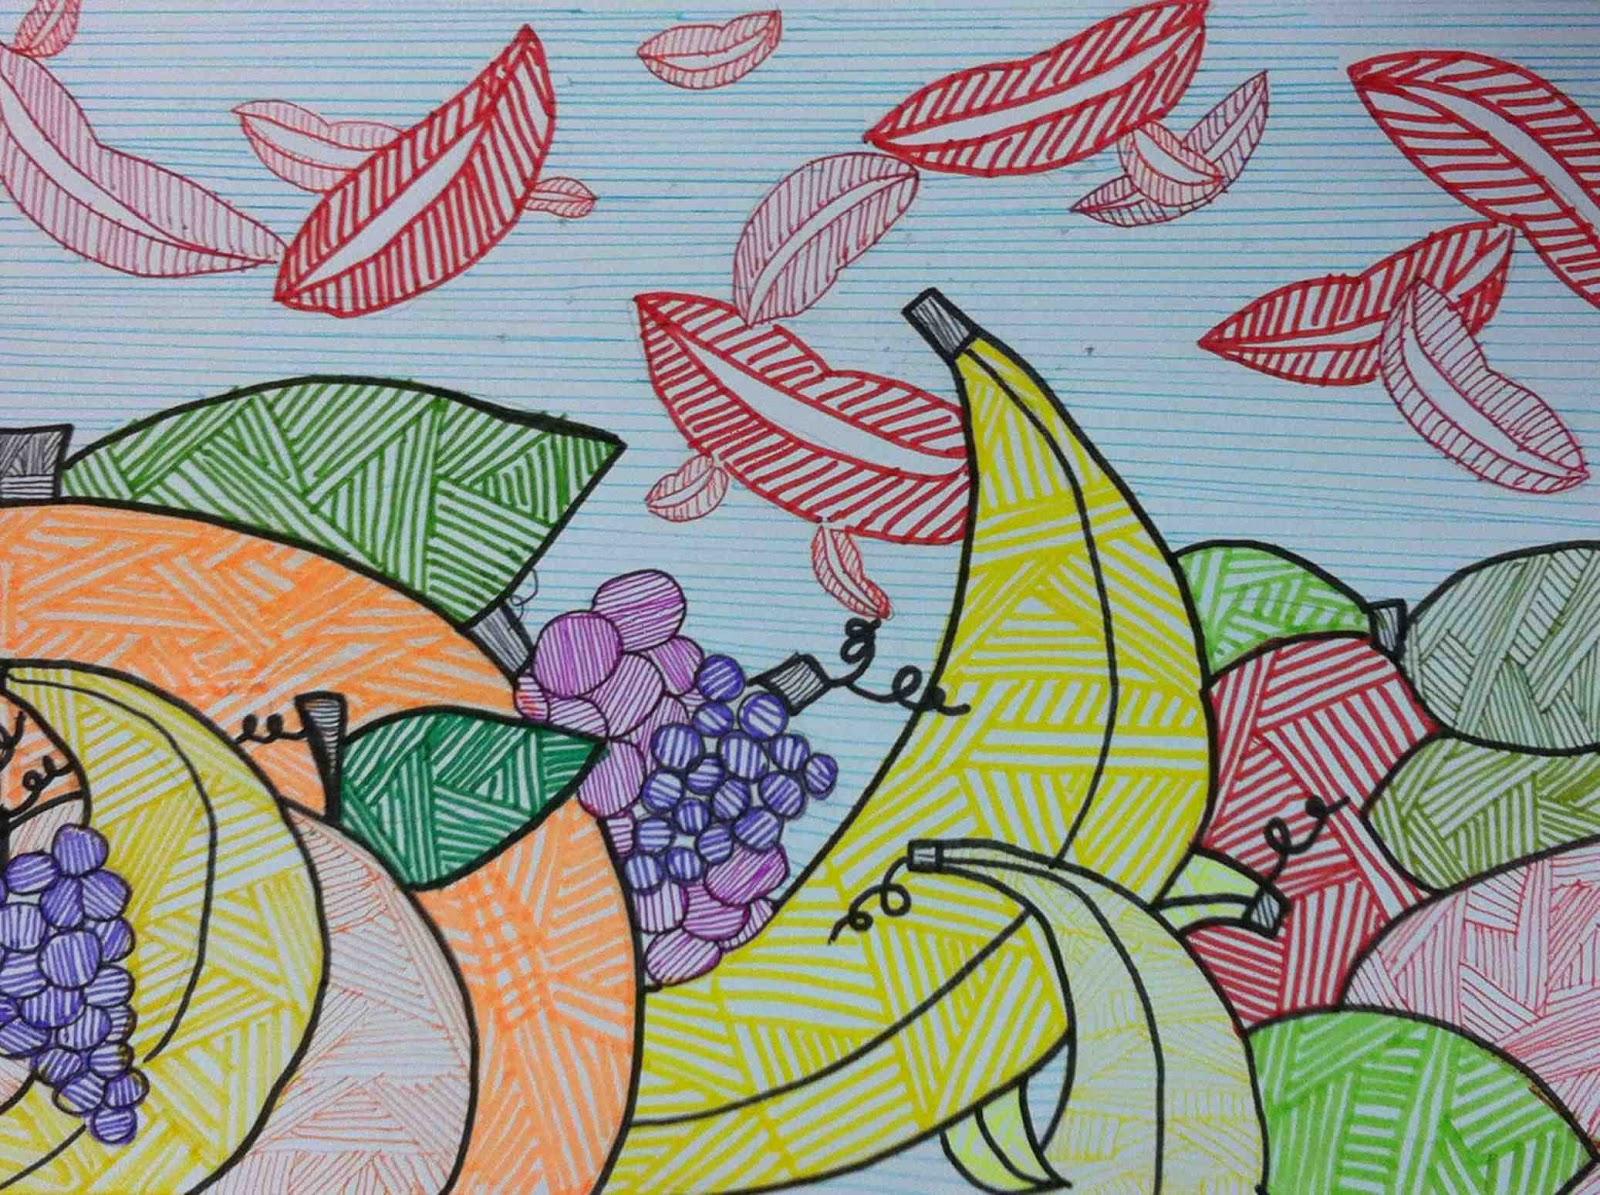 Dibujo De Lineas Paisaje: Conlineo Dibujos De Paisajes En Lineas